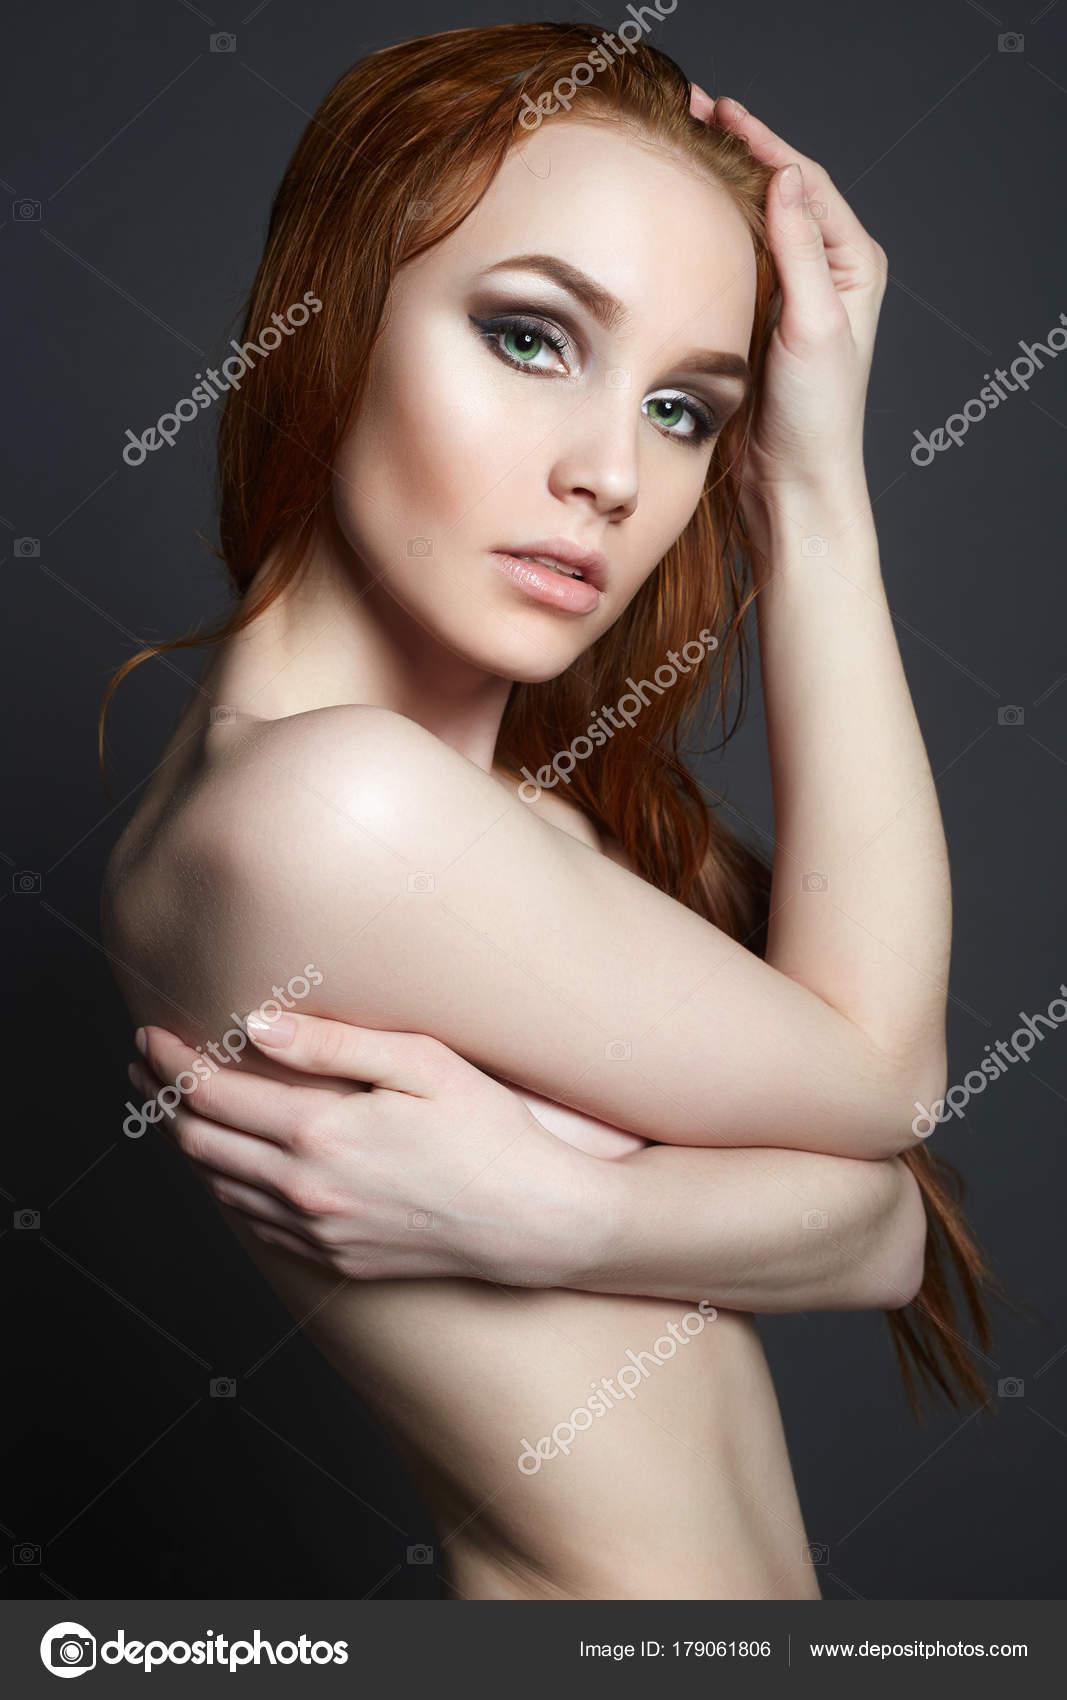 obrázky nahých krás